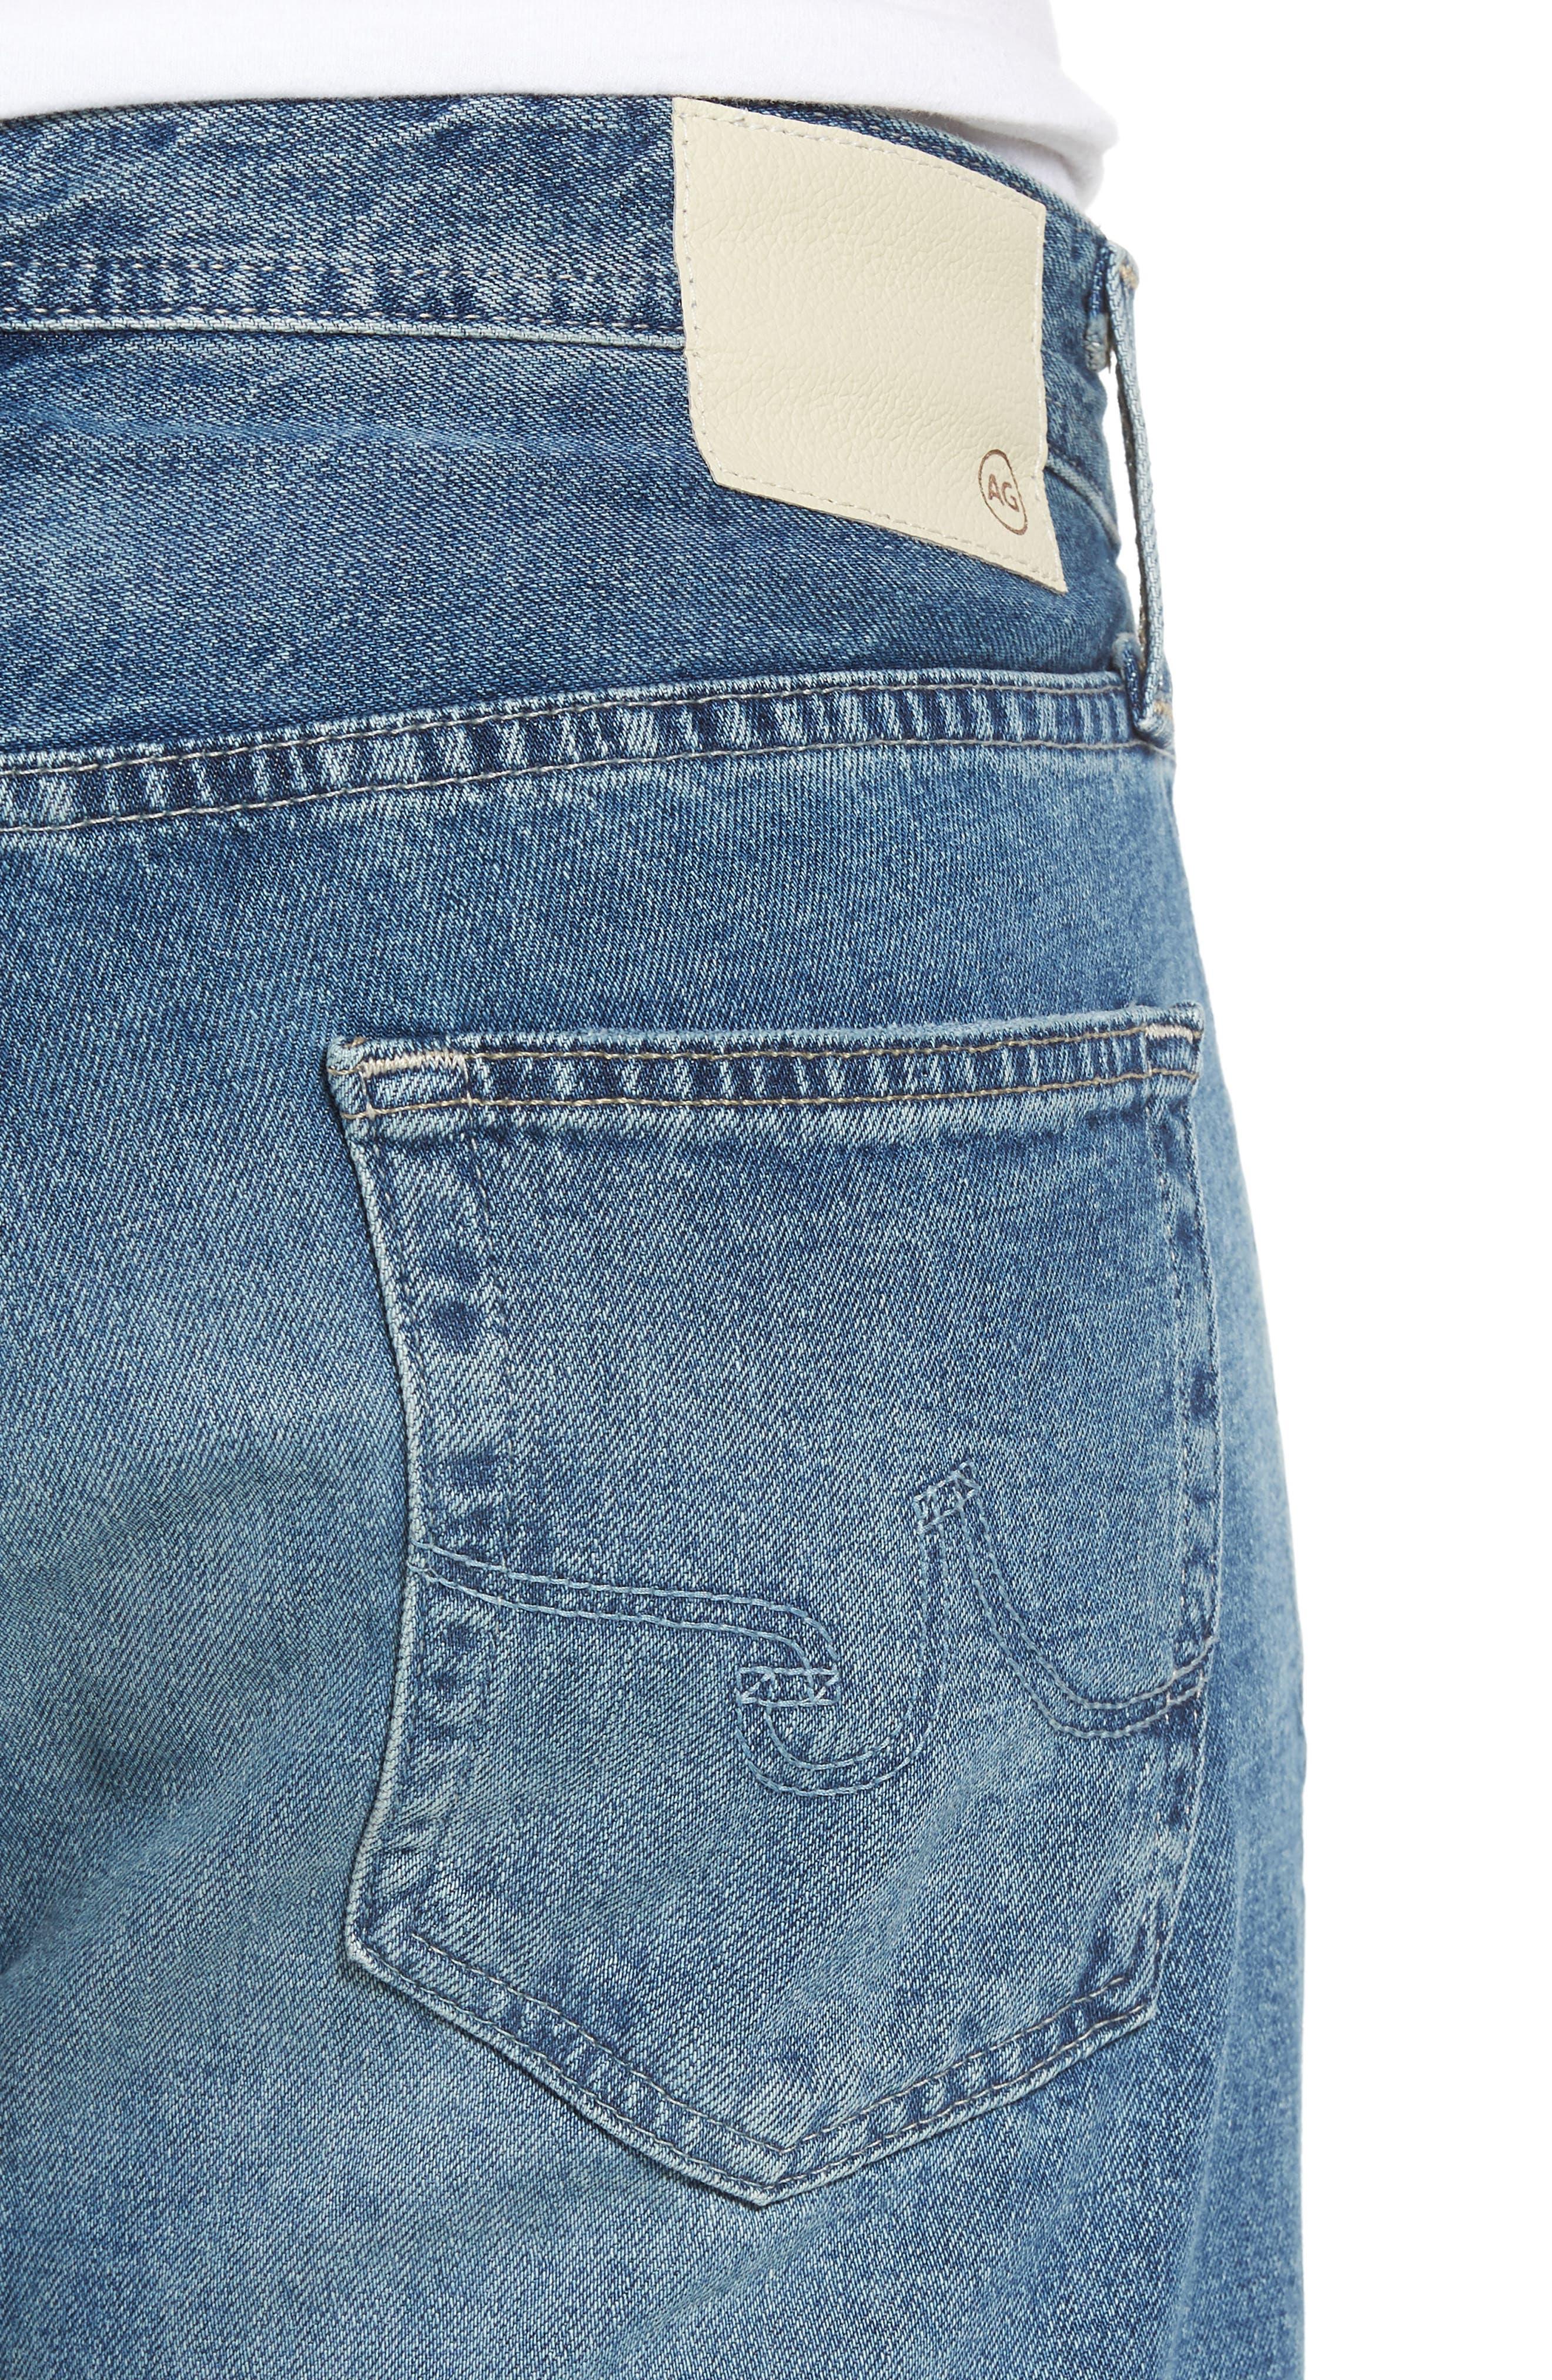 Pipe Slim Straight Leg Jeans,                             Alternate thumbnail 4, color,                             464